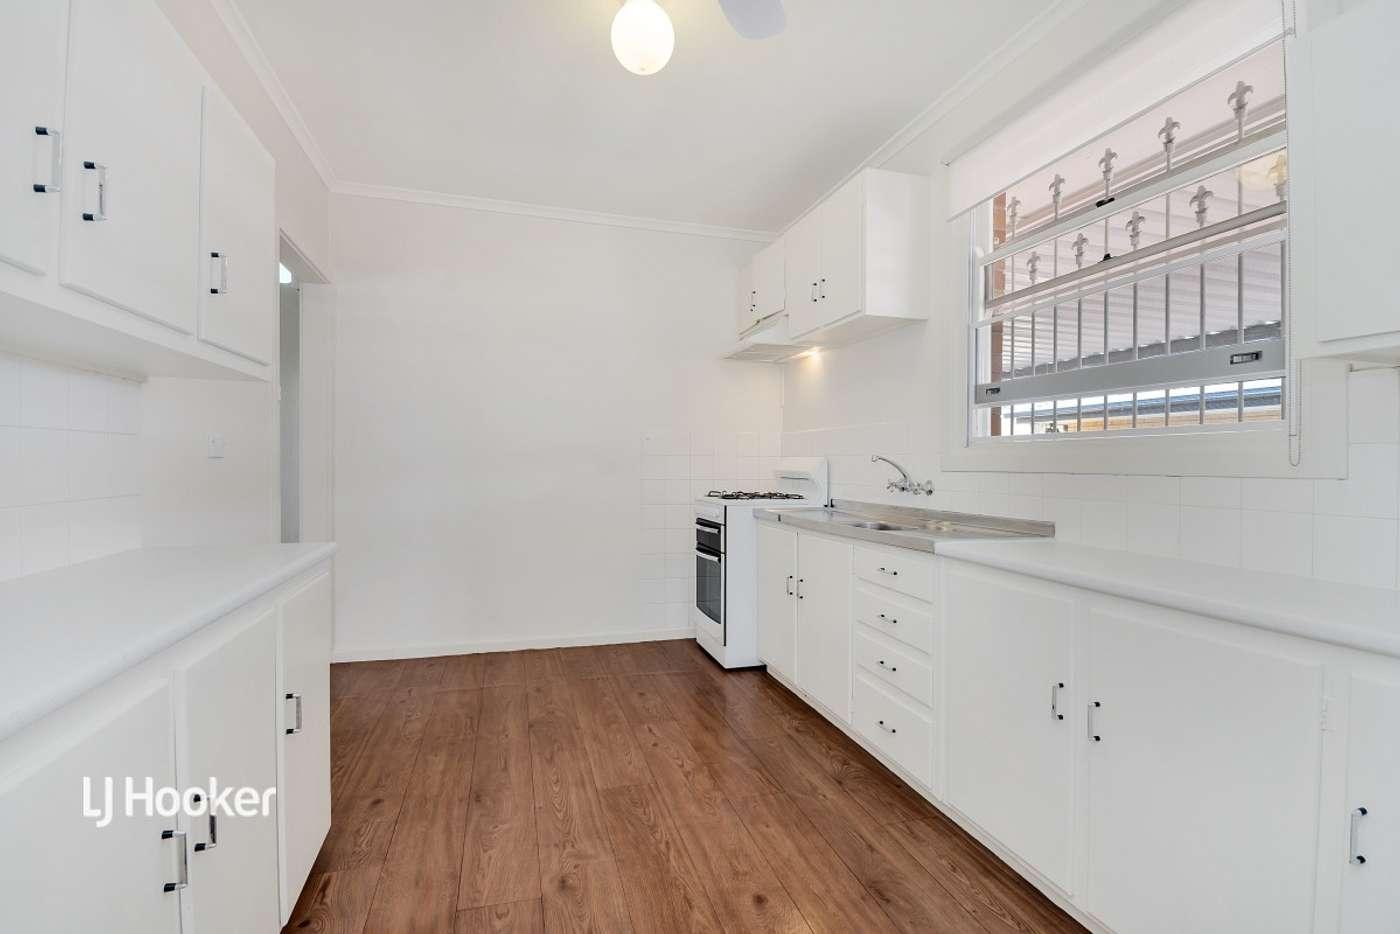 Fifth view of Homely house listing, 54B Dulkara Road, Ingle Farm SA 5098